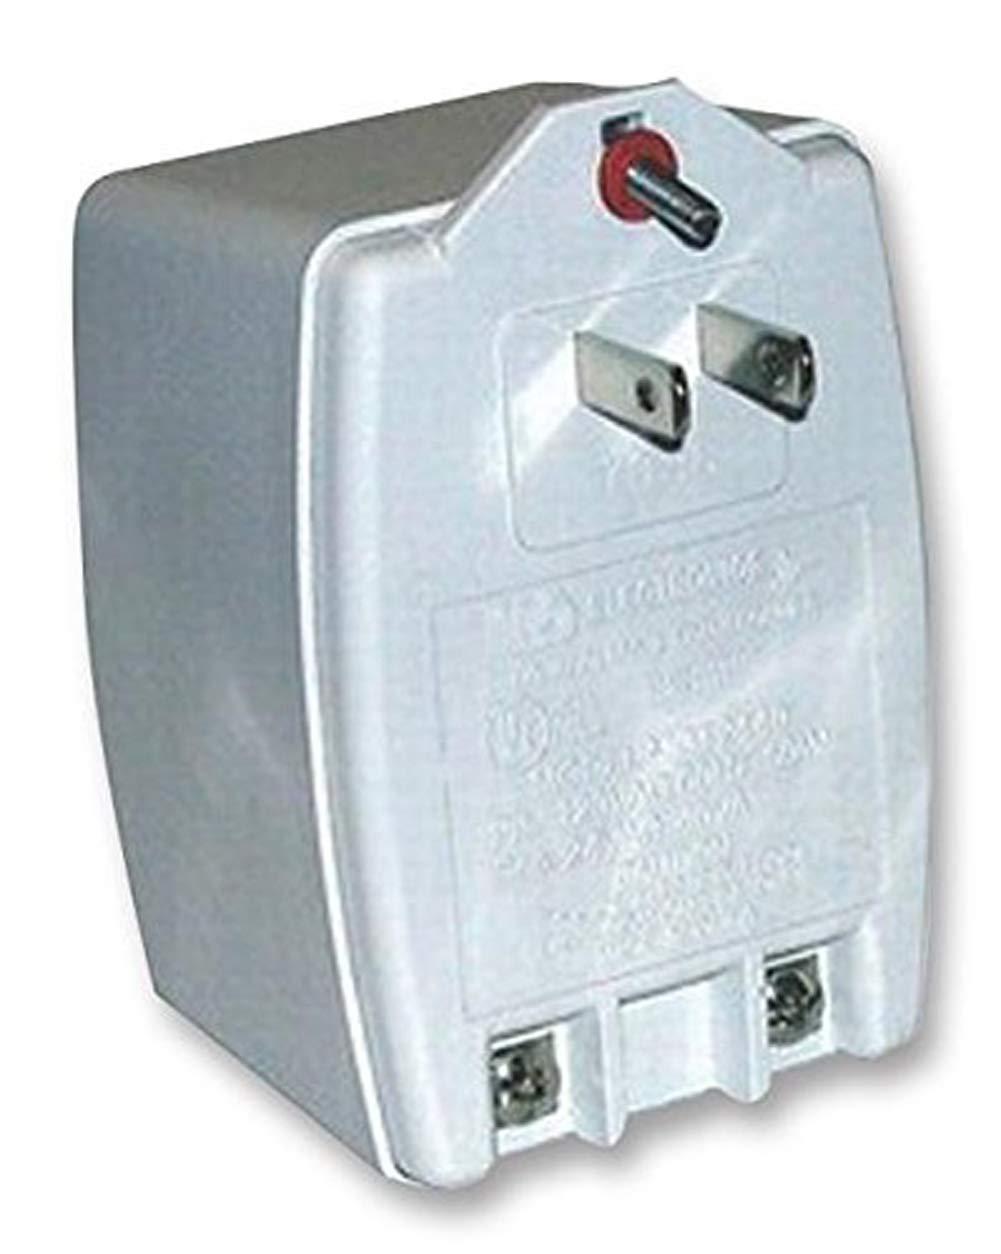 Class II Transformer - 24 Volt AC, 40 VA, UL/CSA Approved : MGT-2440 FBA_MGT-2440